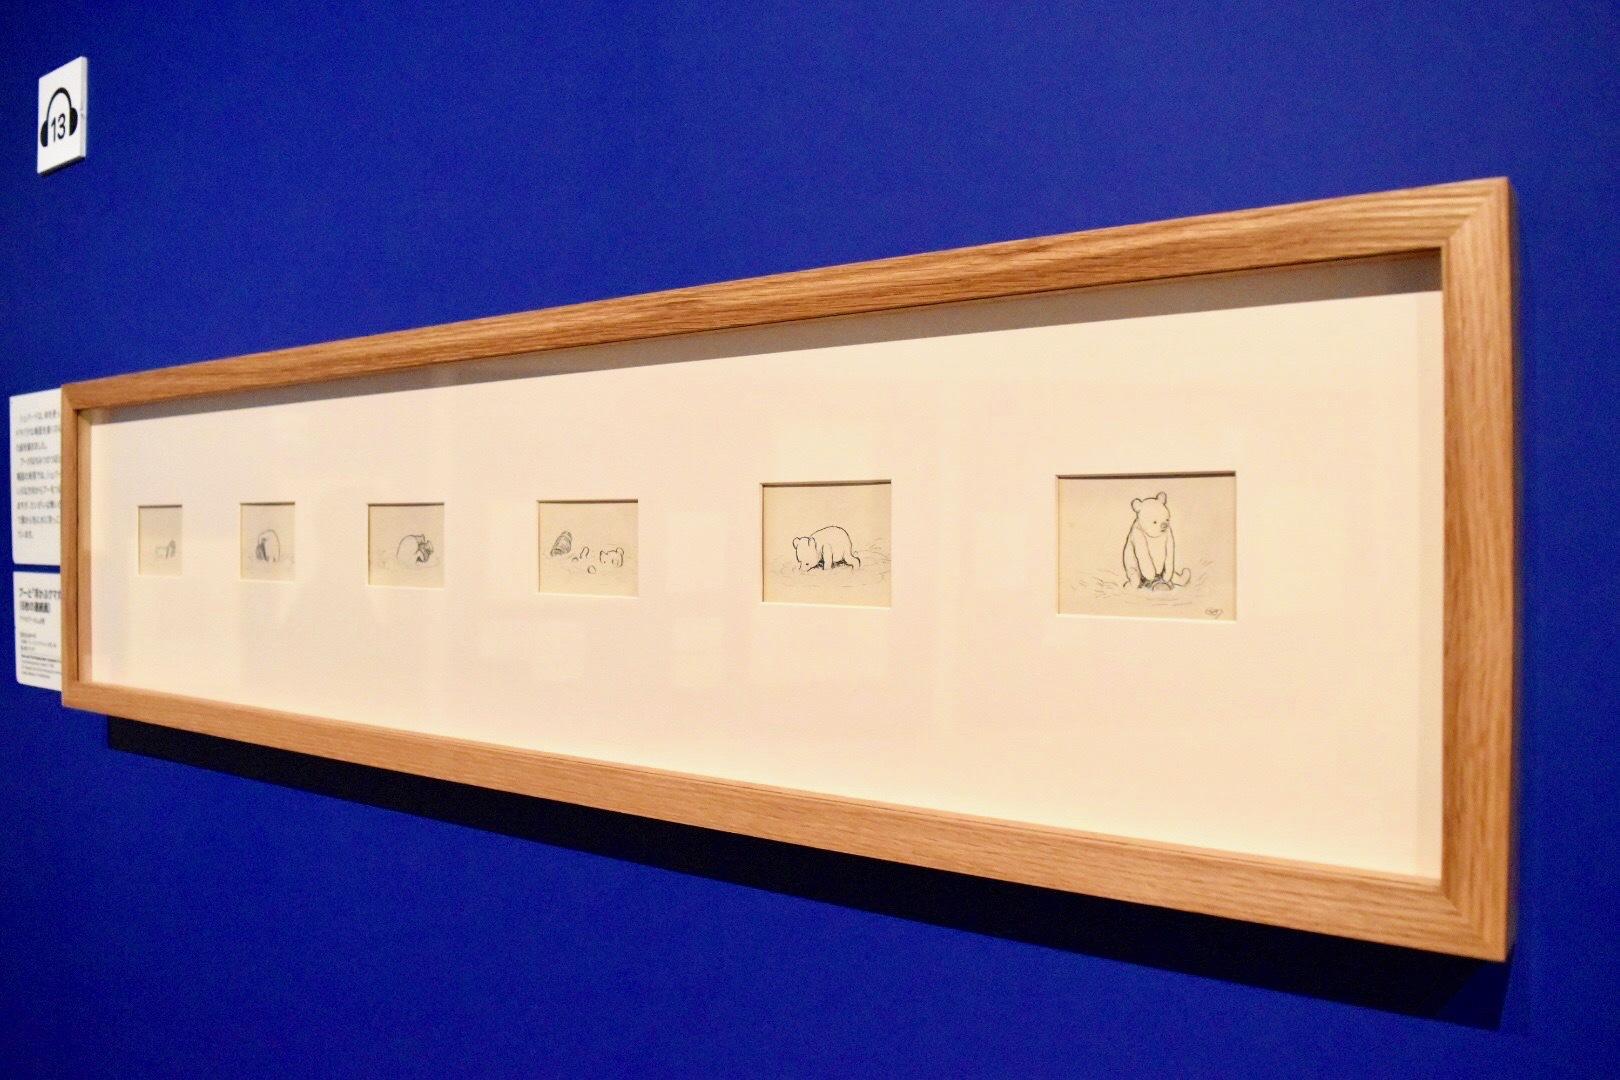 E.H.シェパード プーと「浮かぶクマ丸」(6枚の連続画)『クマのプーさん』9章 1926年 個人蔵(オランダ)